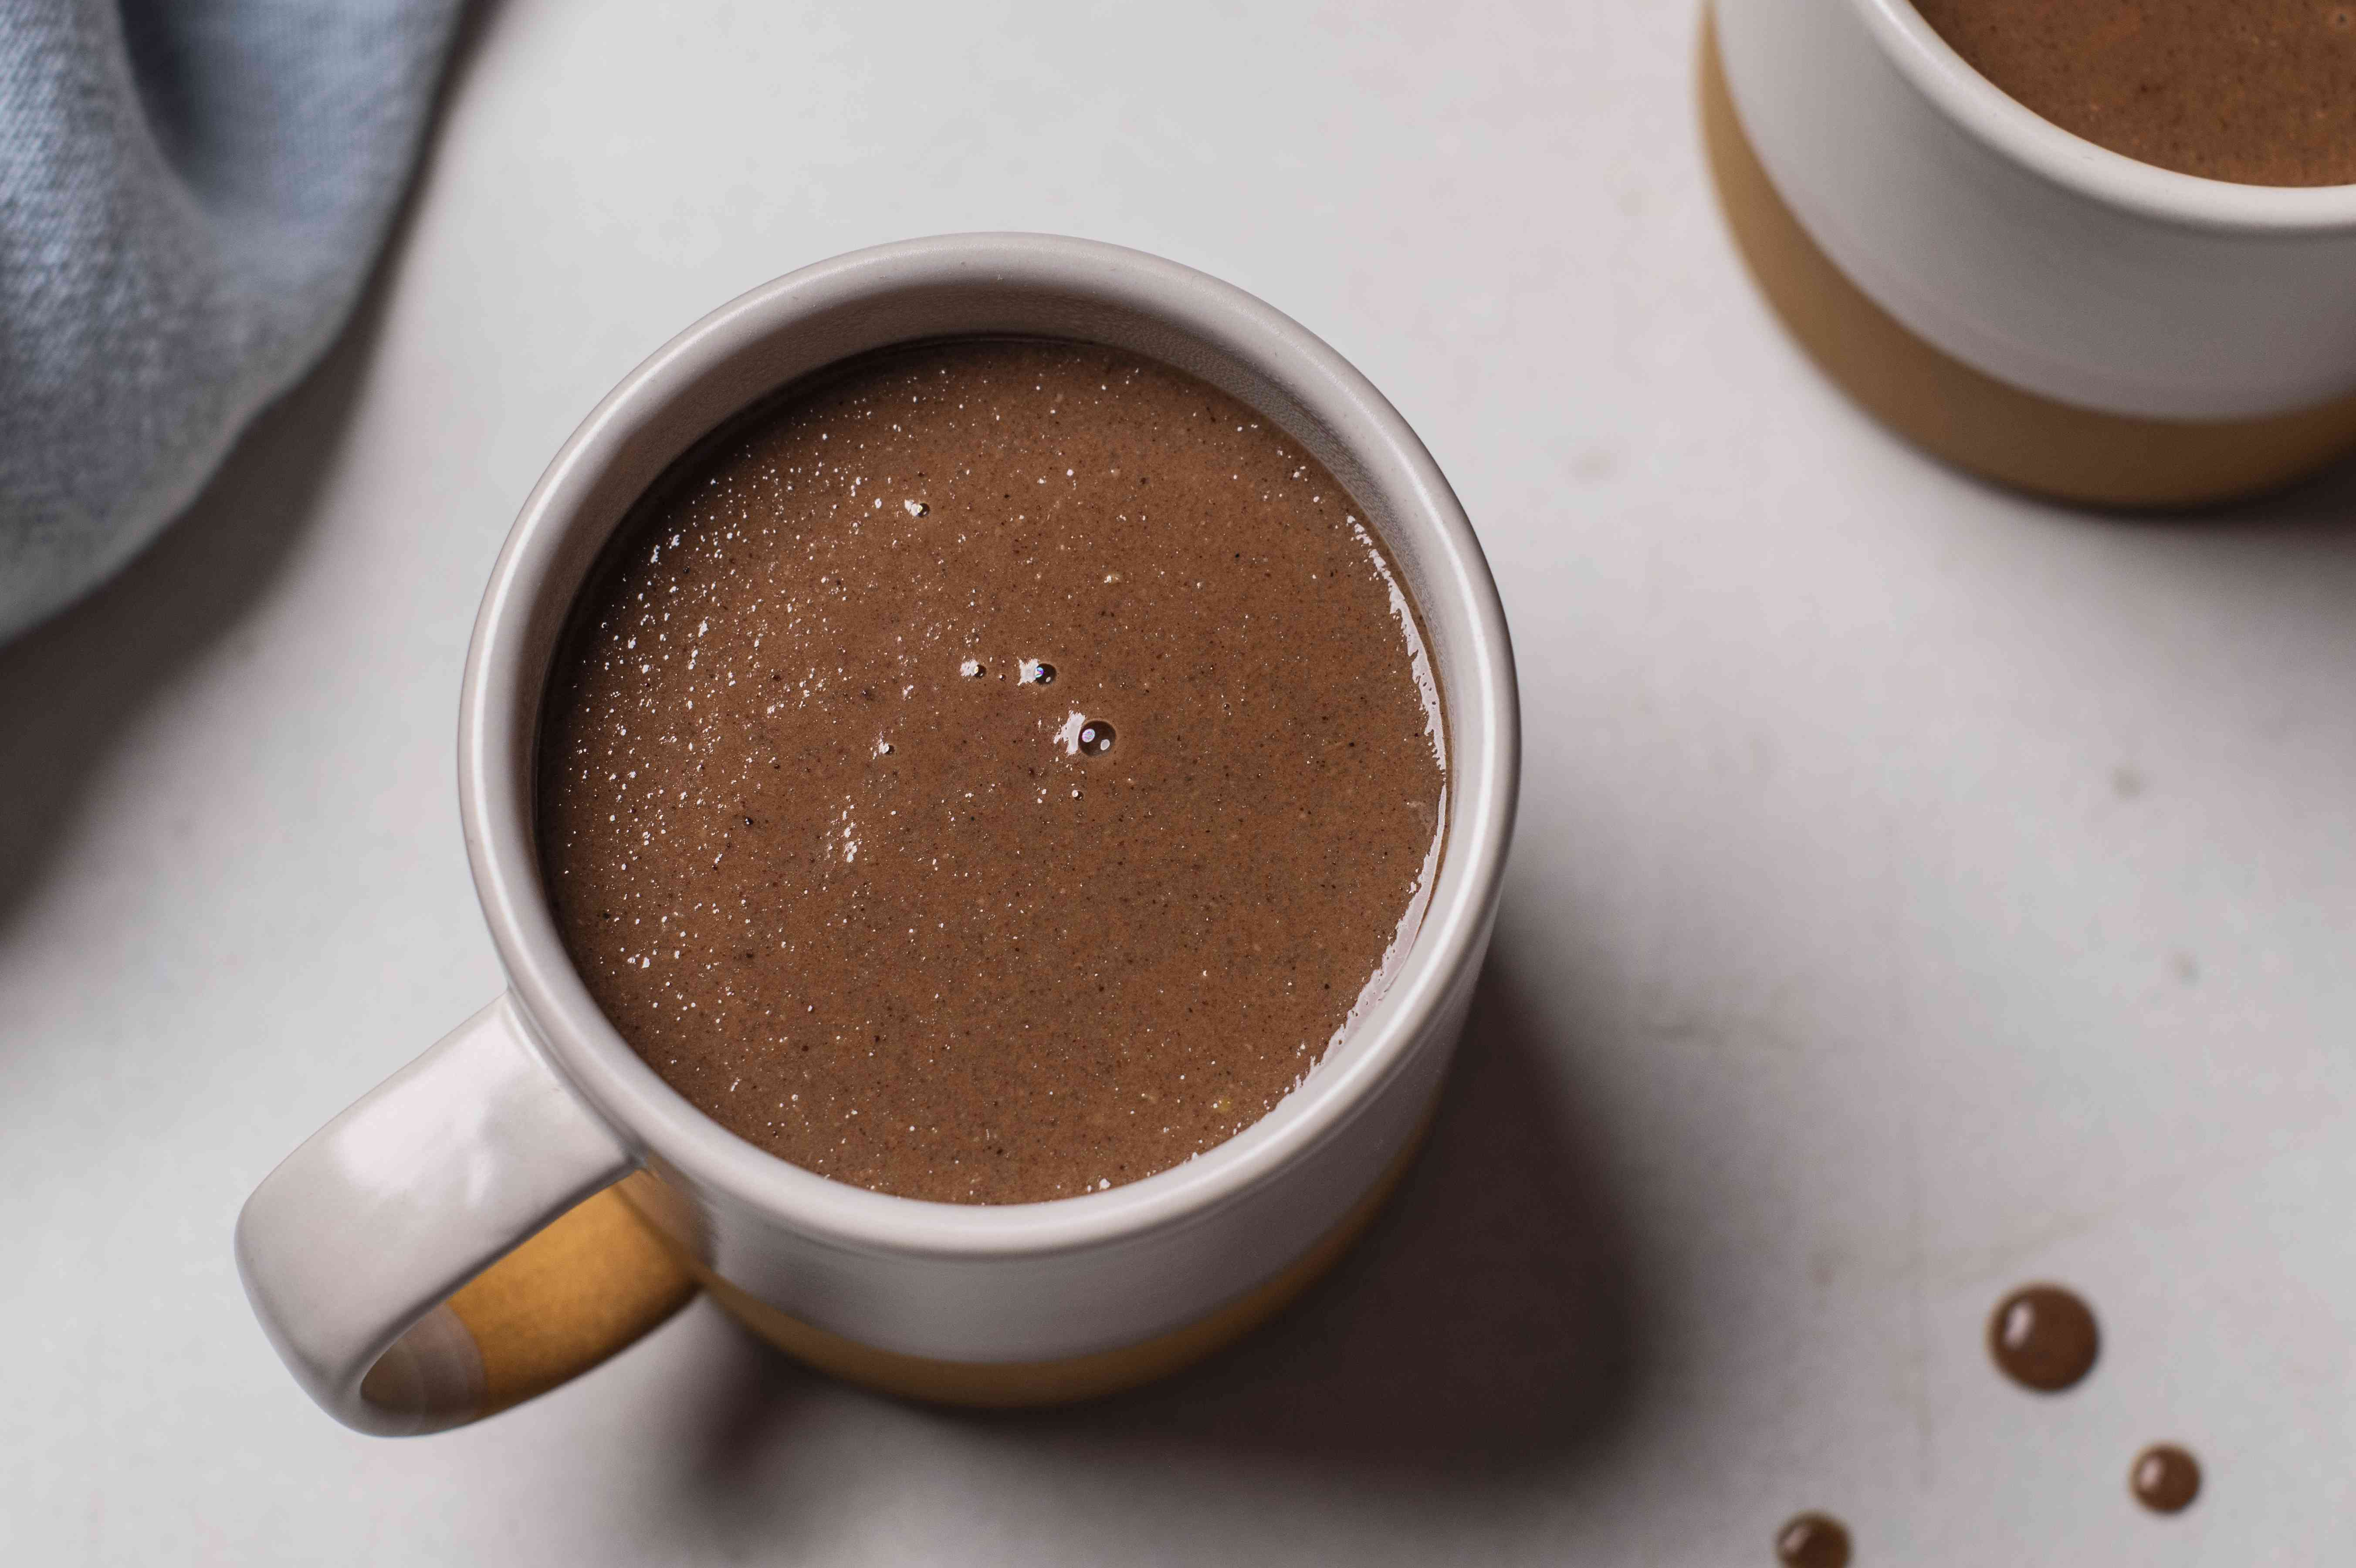 Champurrado chocolate drink recipe